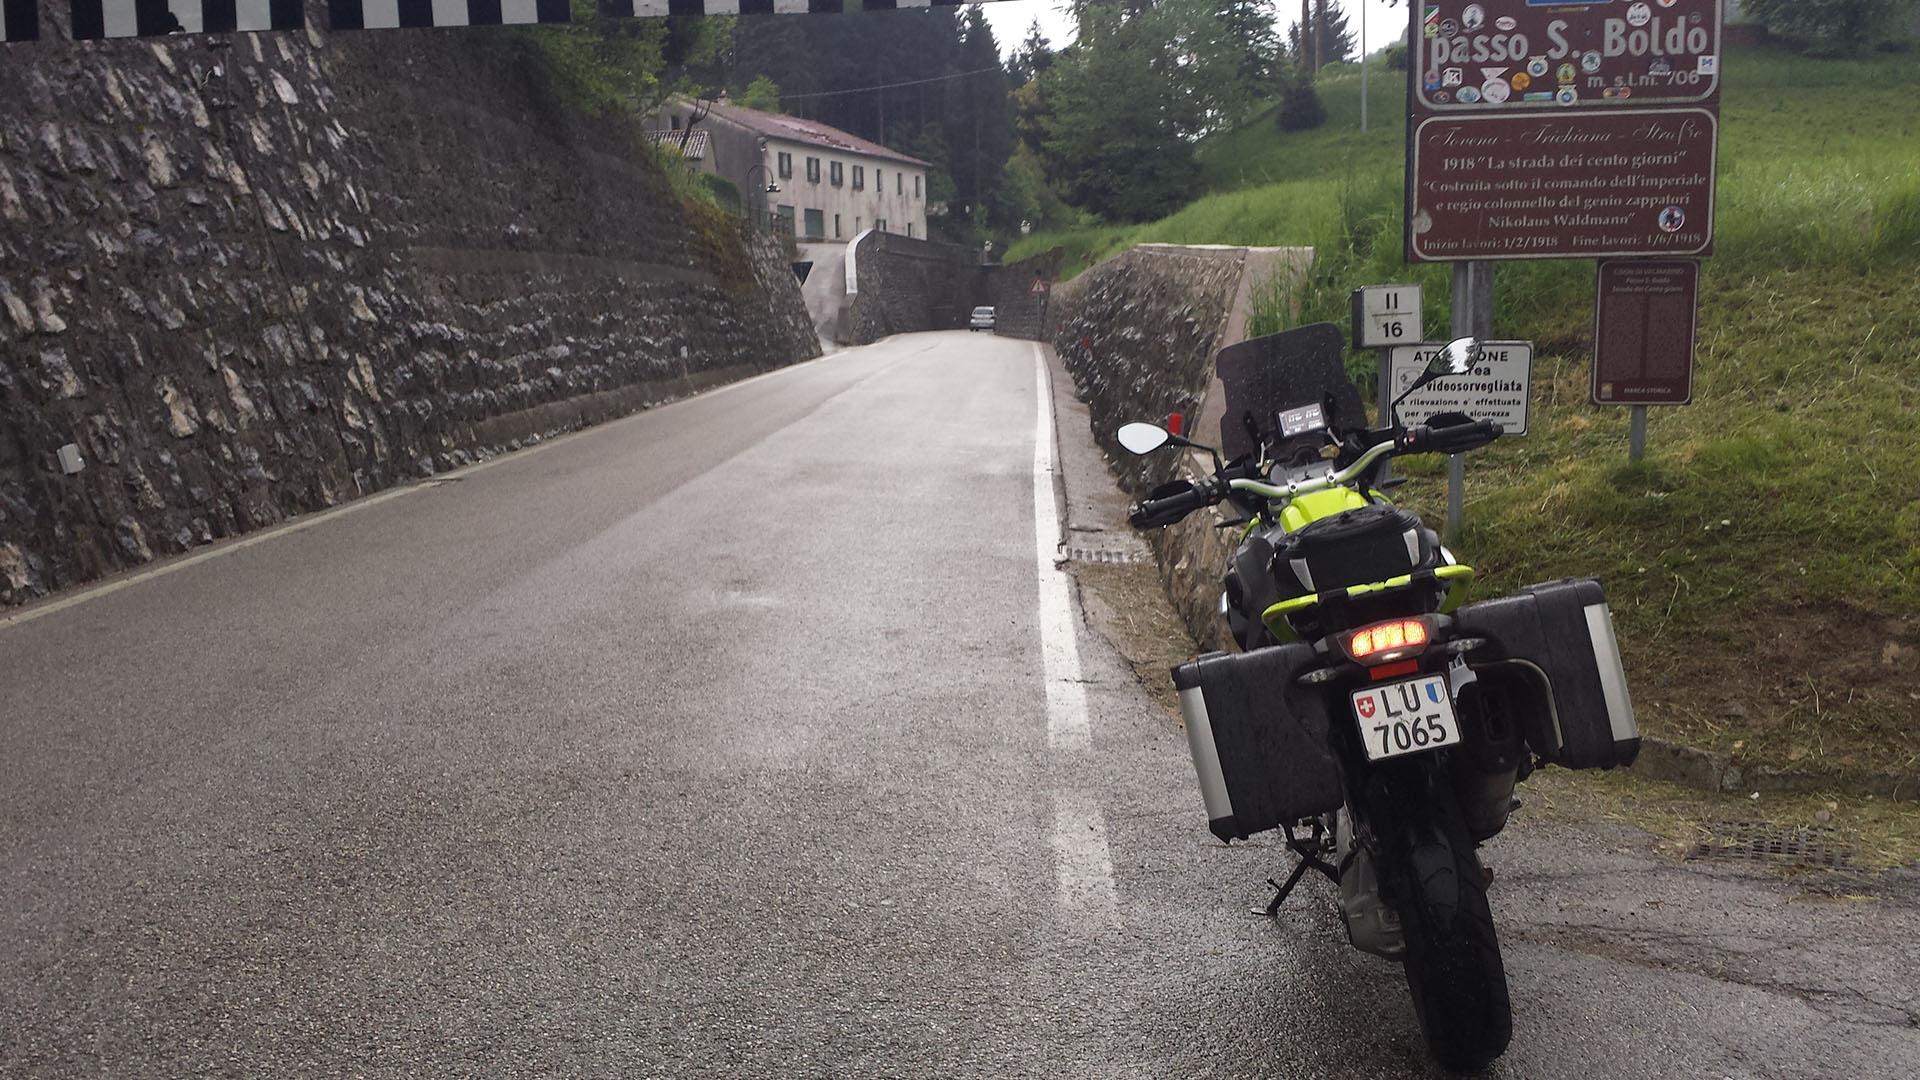 0706 - I - Passo San Boldo (Passo Sant Ubaldo)